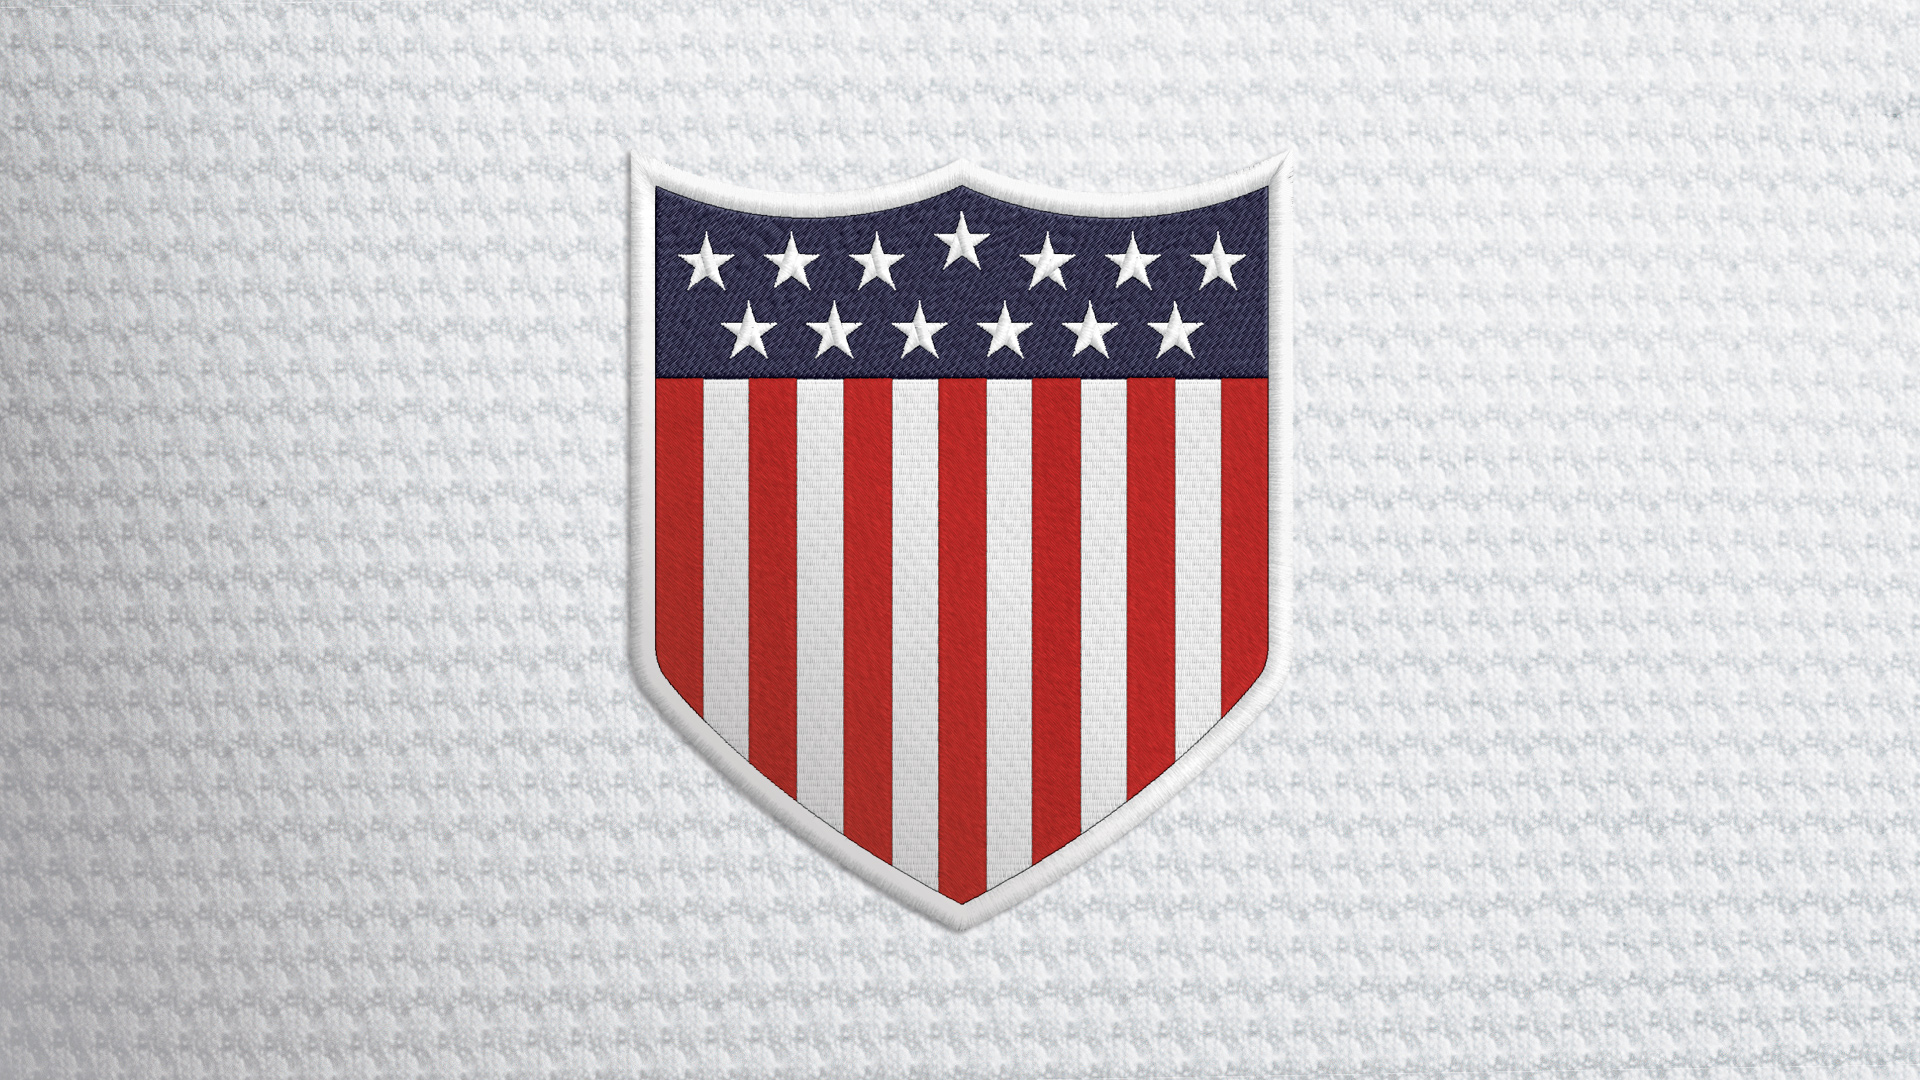 77] Us Soccer Wallpaper on WallpaperSafari 1920x1080